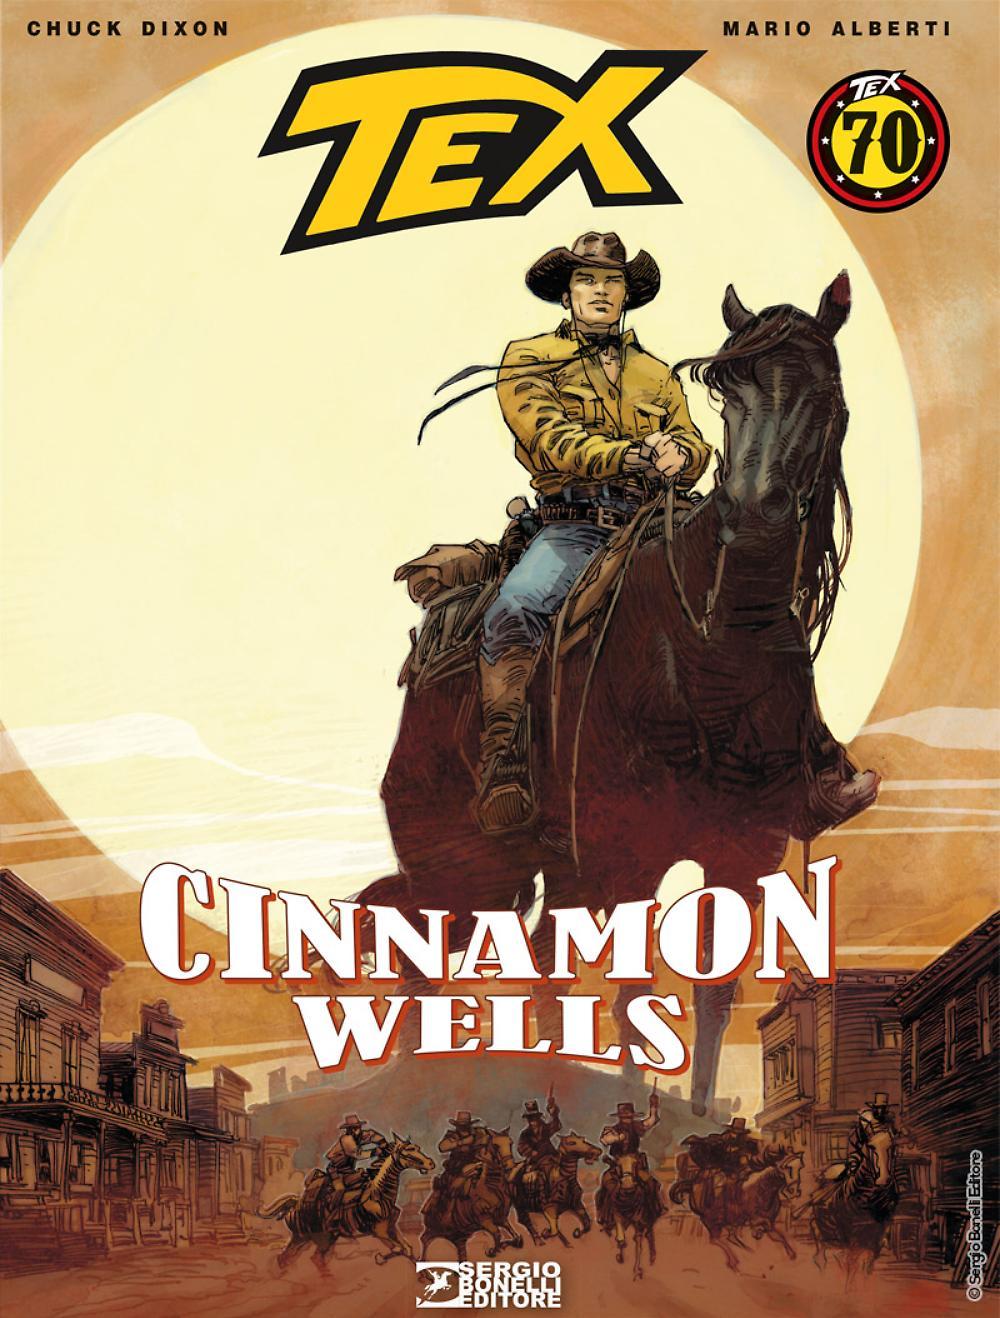 jpg--cinnamon_wells___tex_romanzi_a_fumetti_08_cover